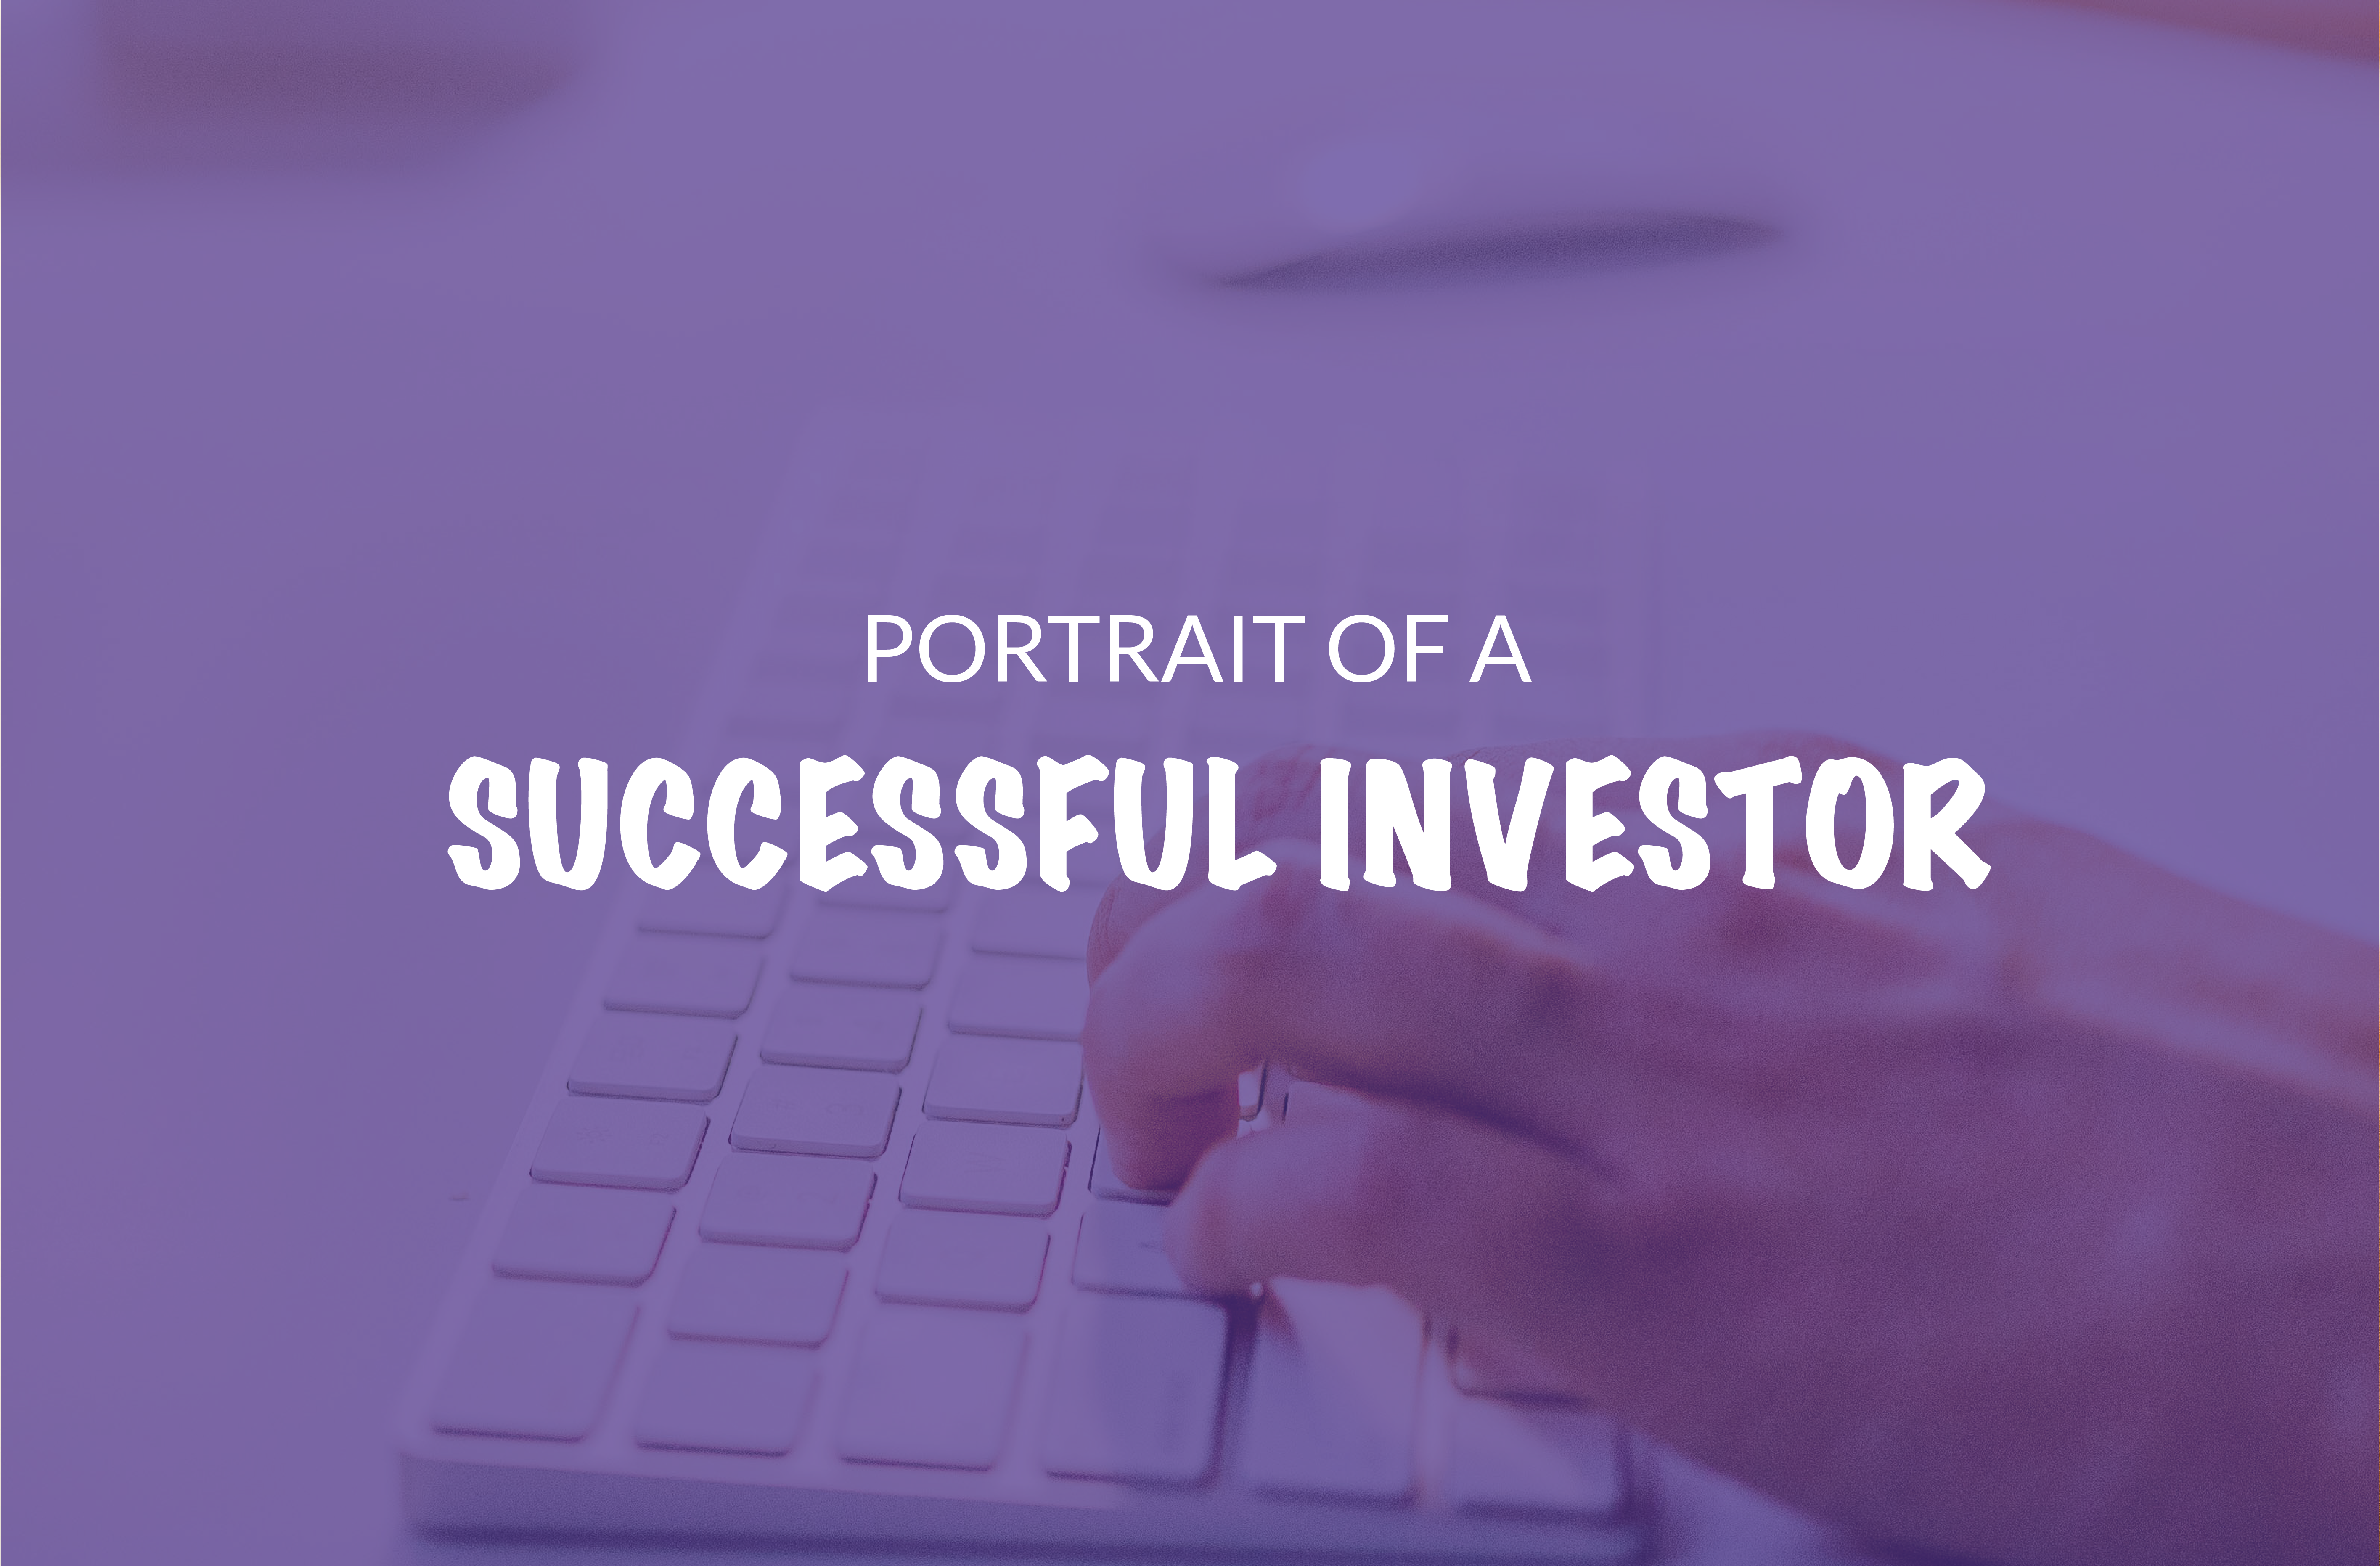 Portrait of a successful investor